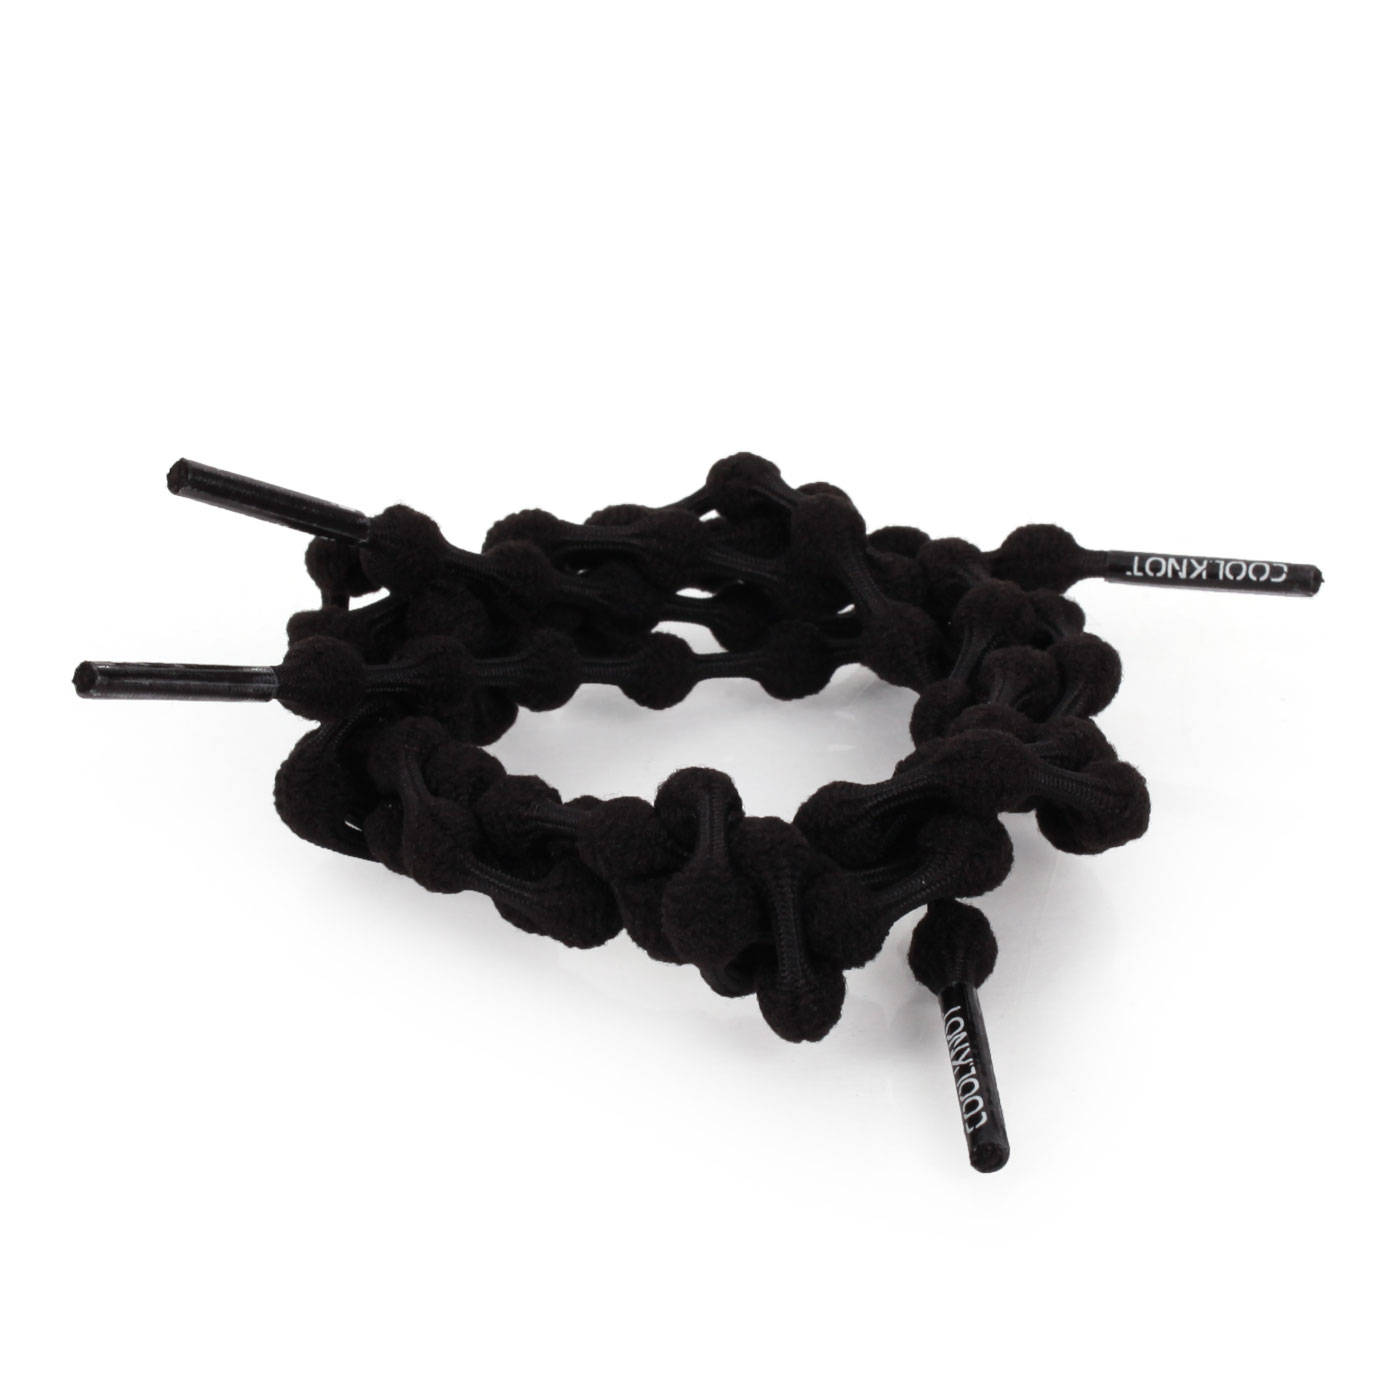 COOLKNOT 豆豆鞋帶(舒適款)60CM 6026201 - 黑